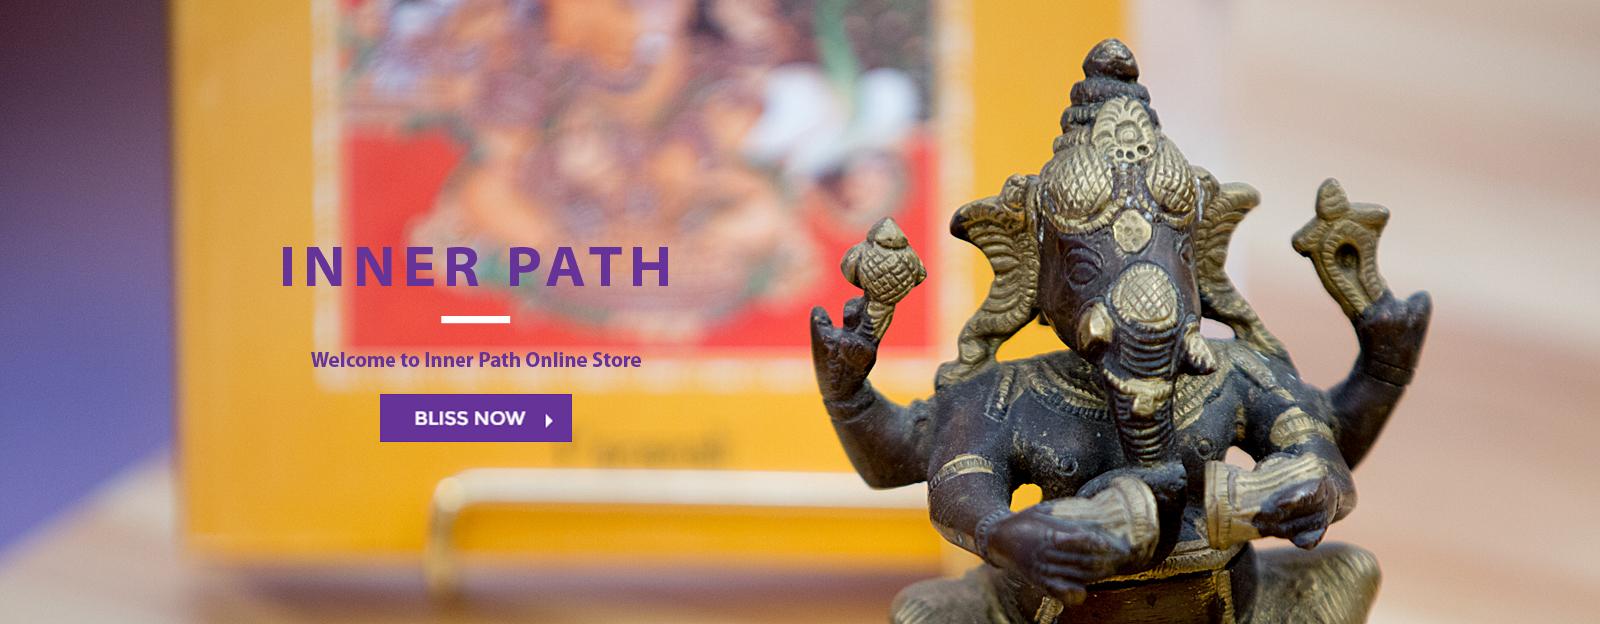 Inner Path Online Store